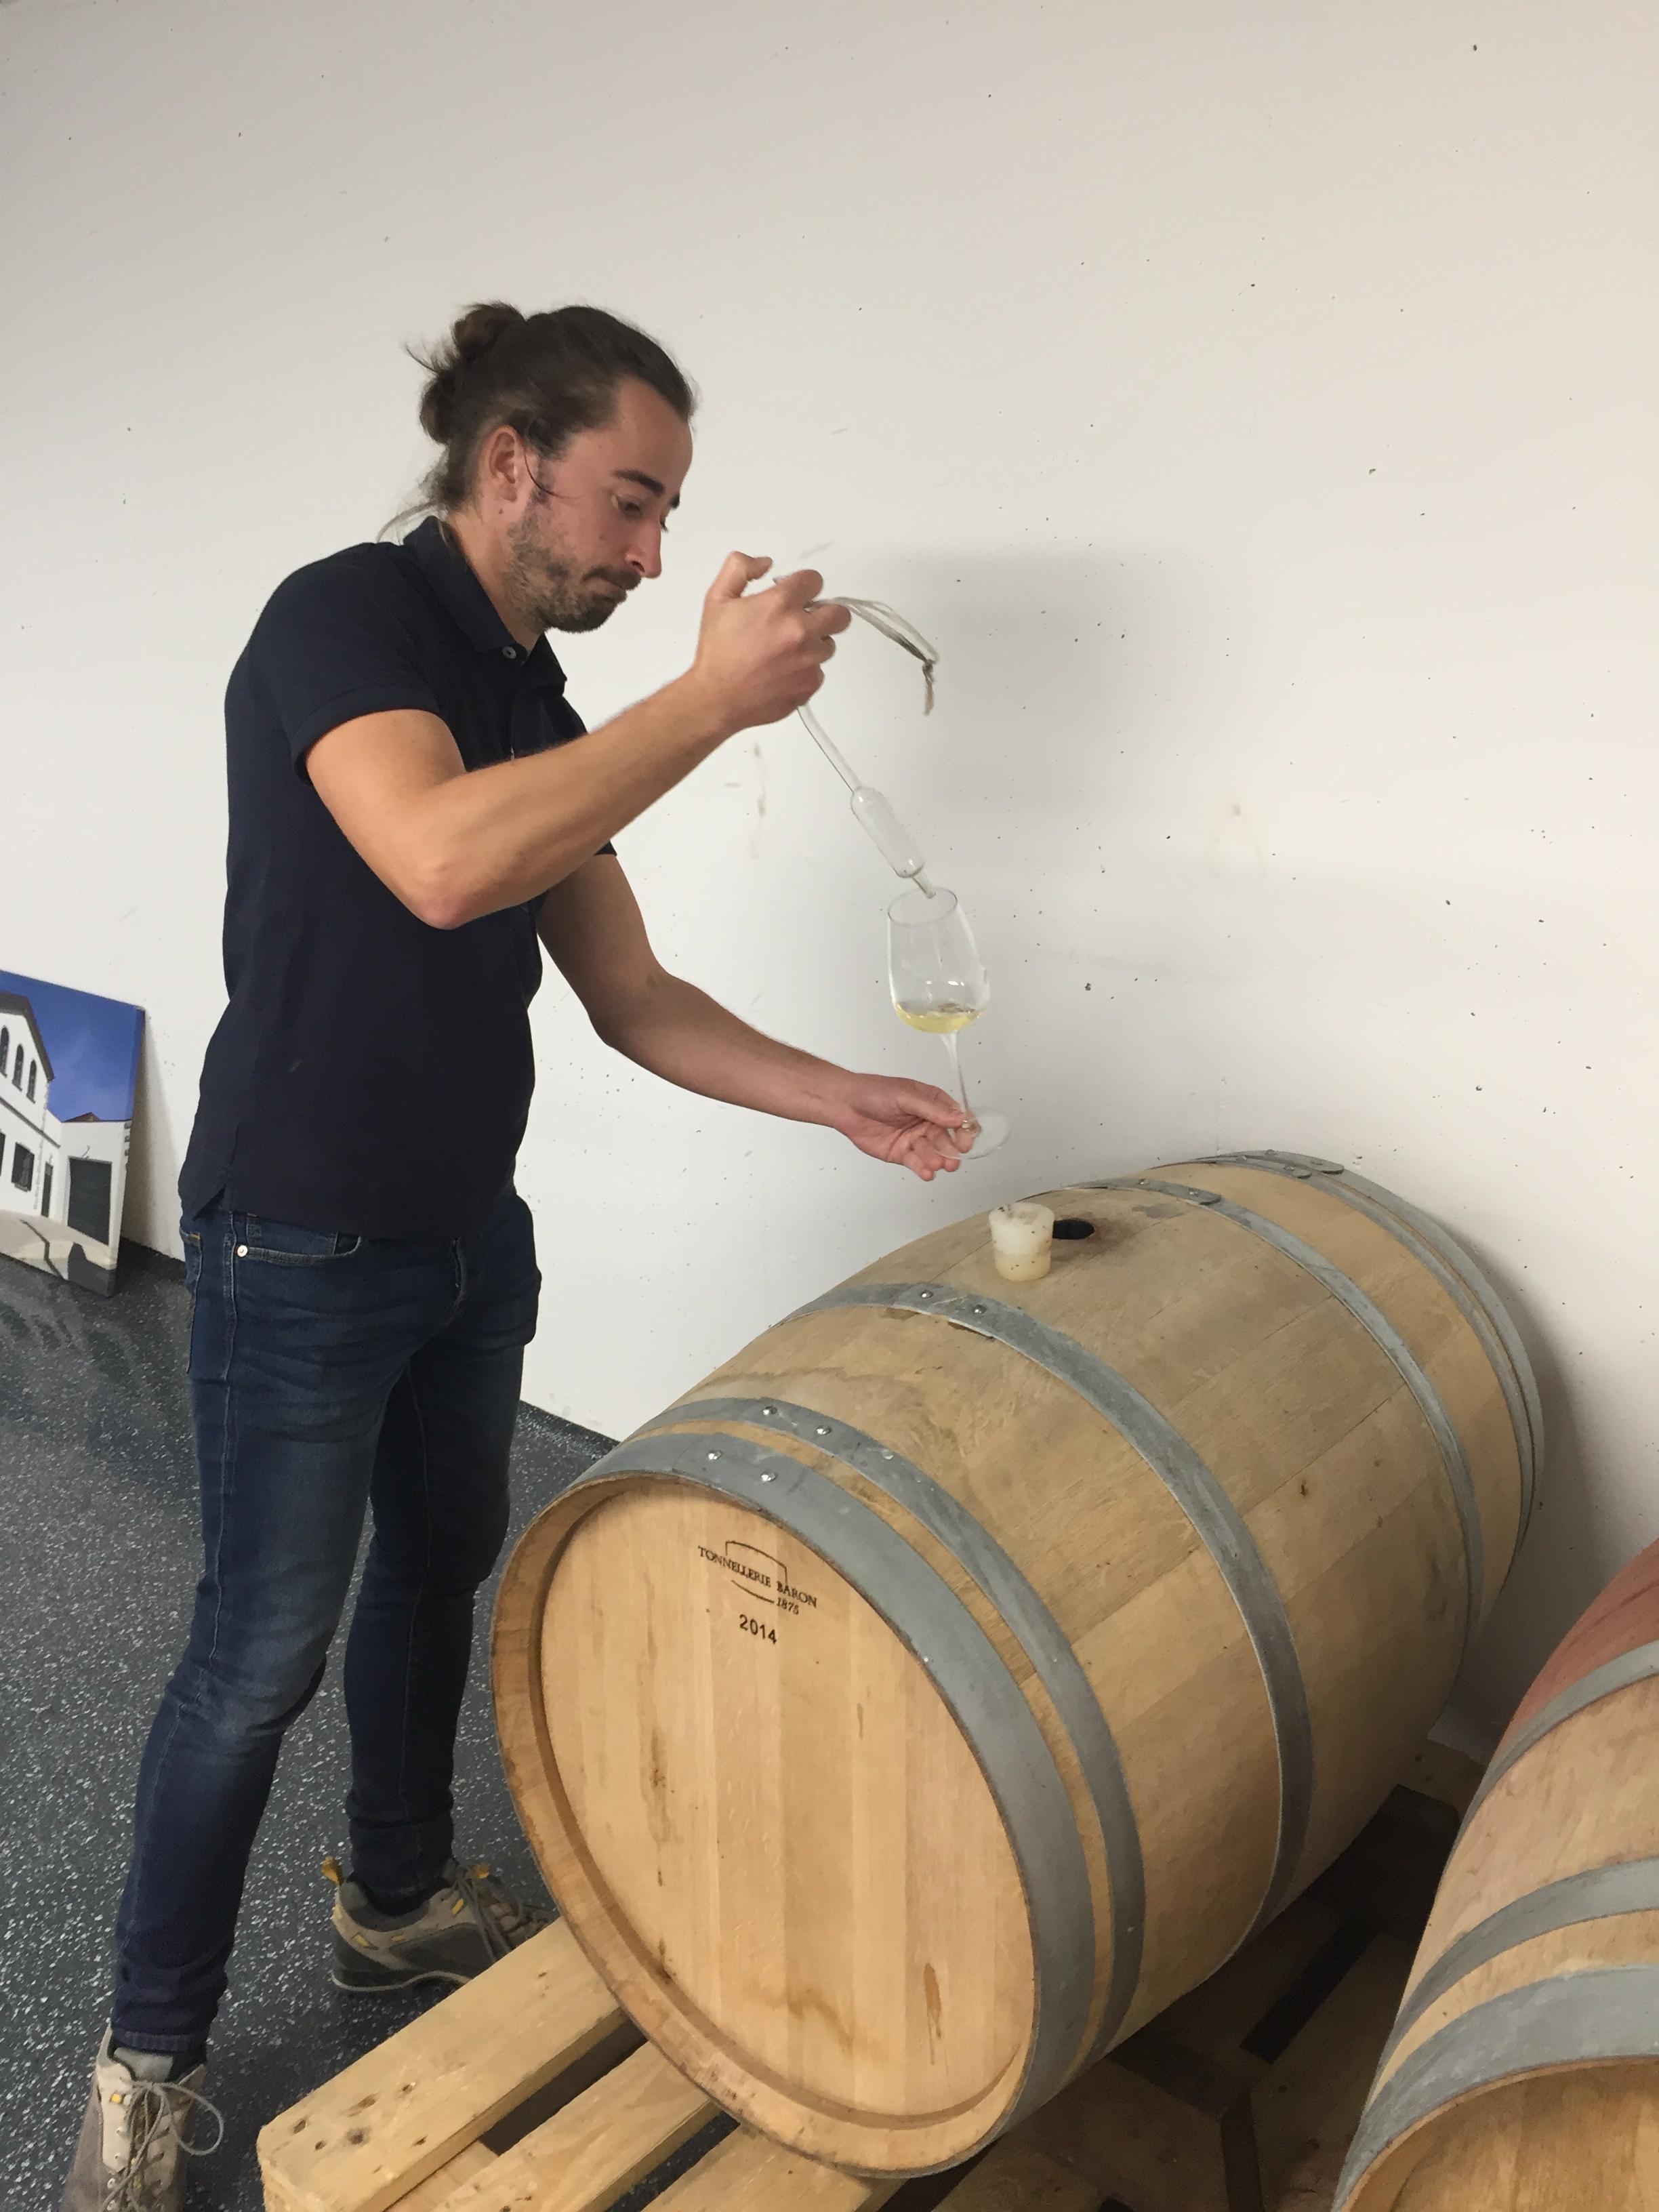 Weingut Mittelbach oak tasting